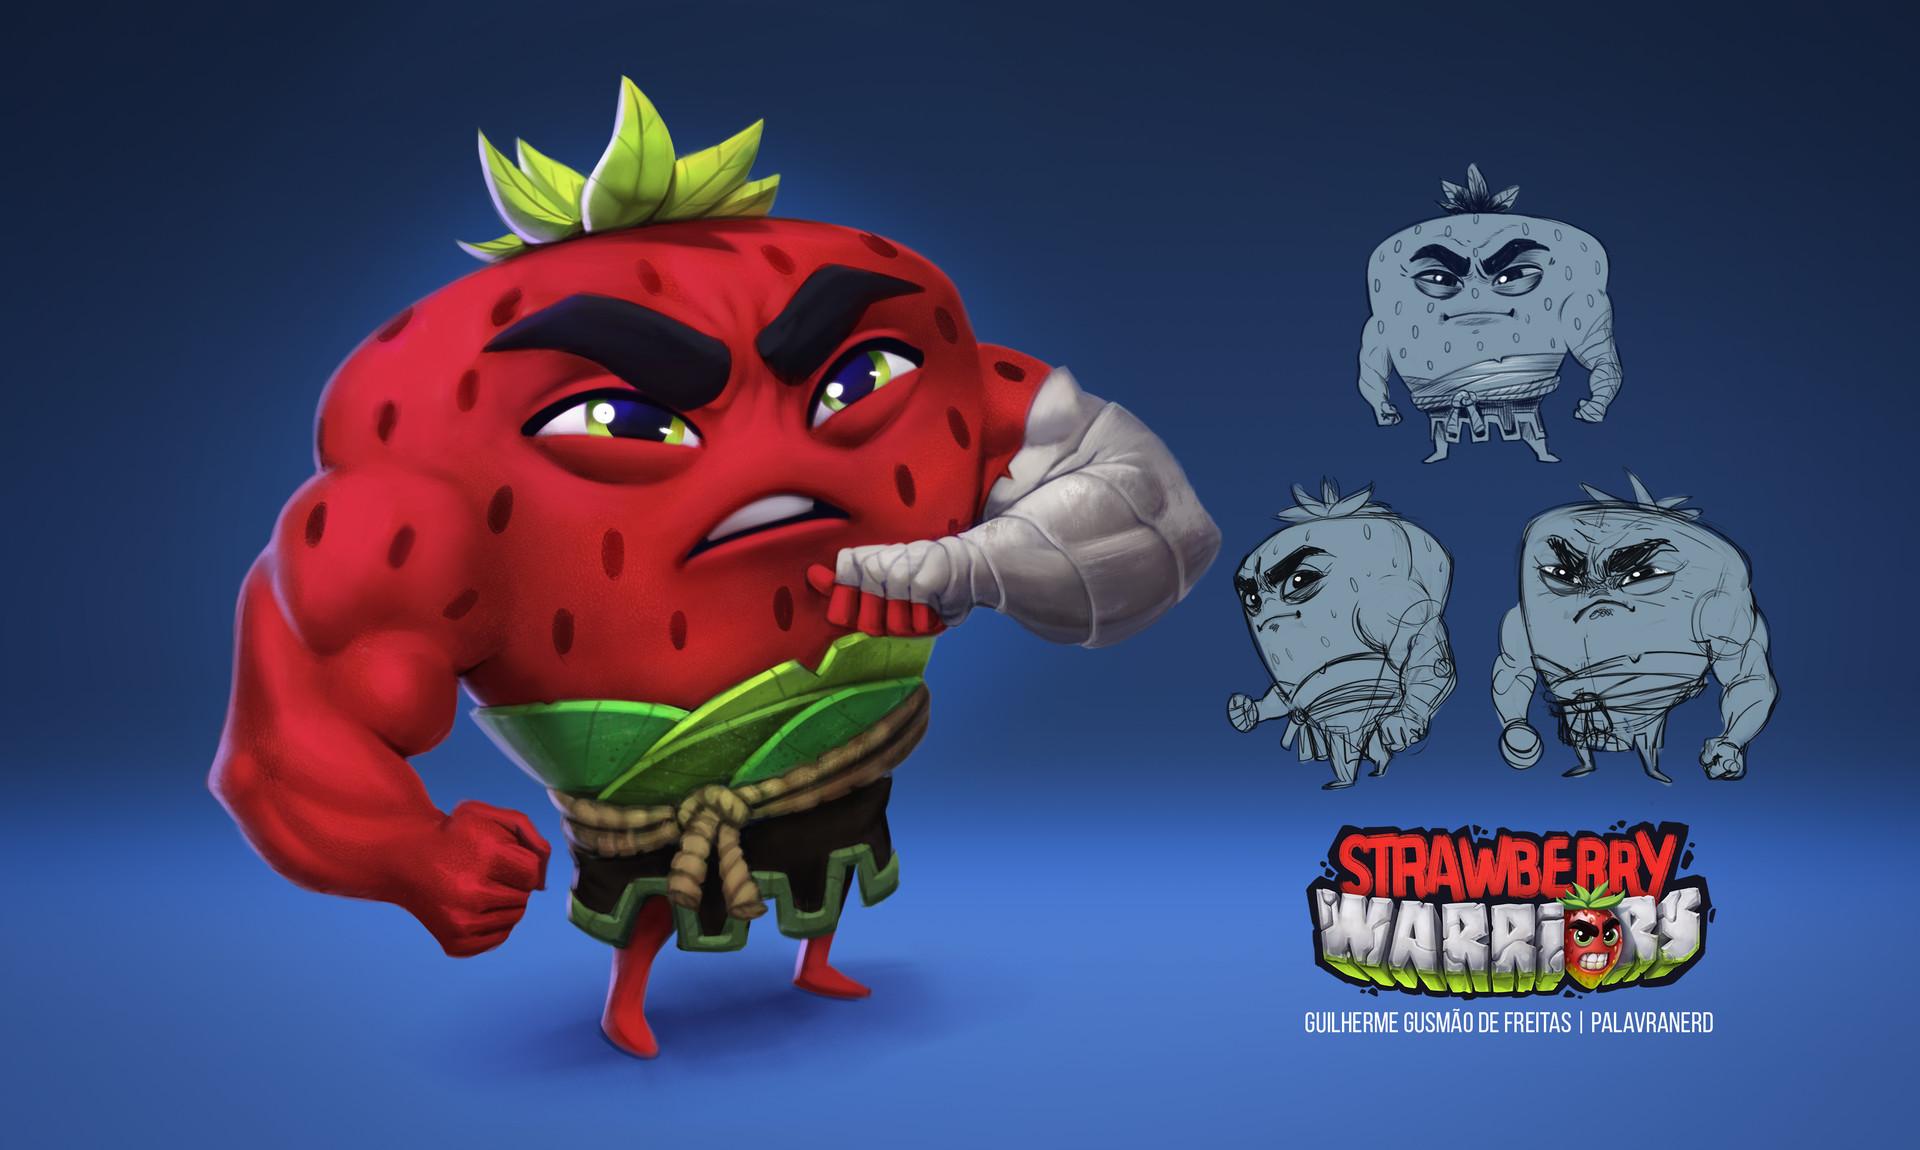 Guilherme freitas strawberry character